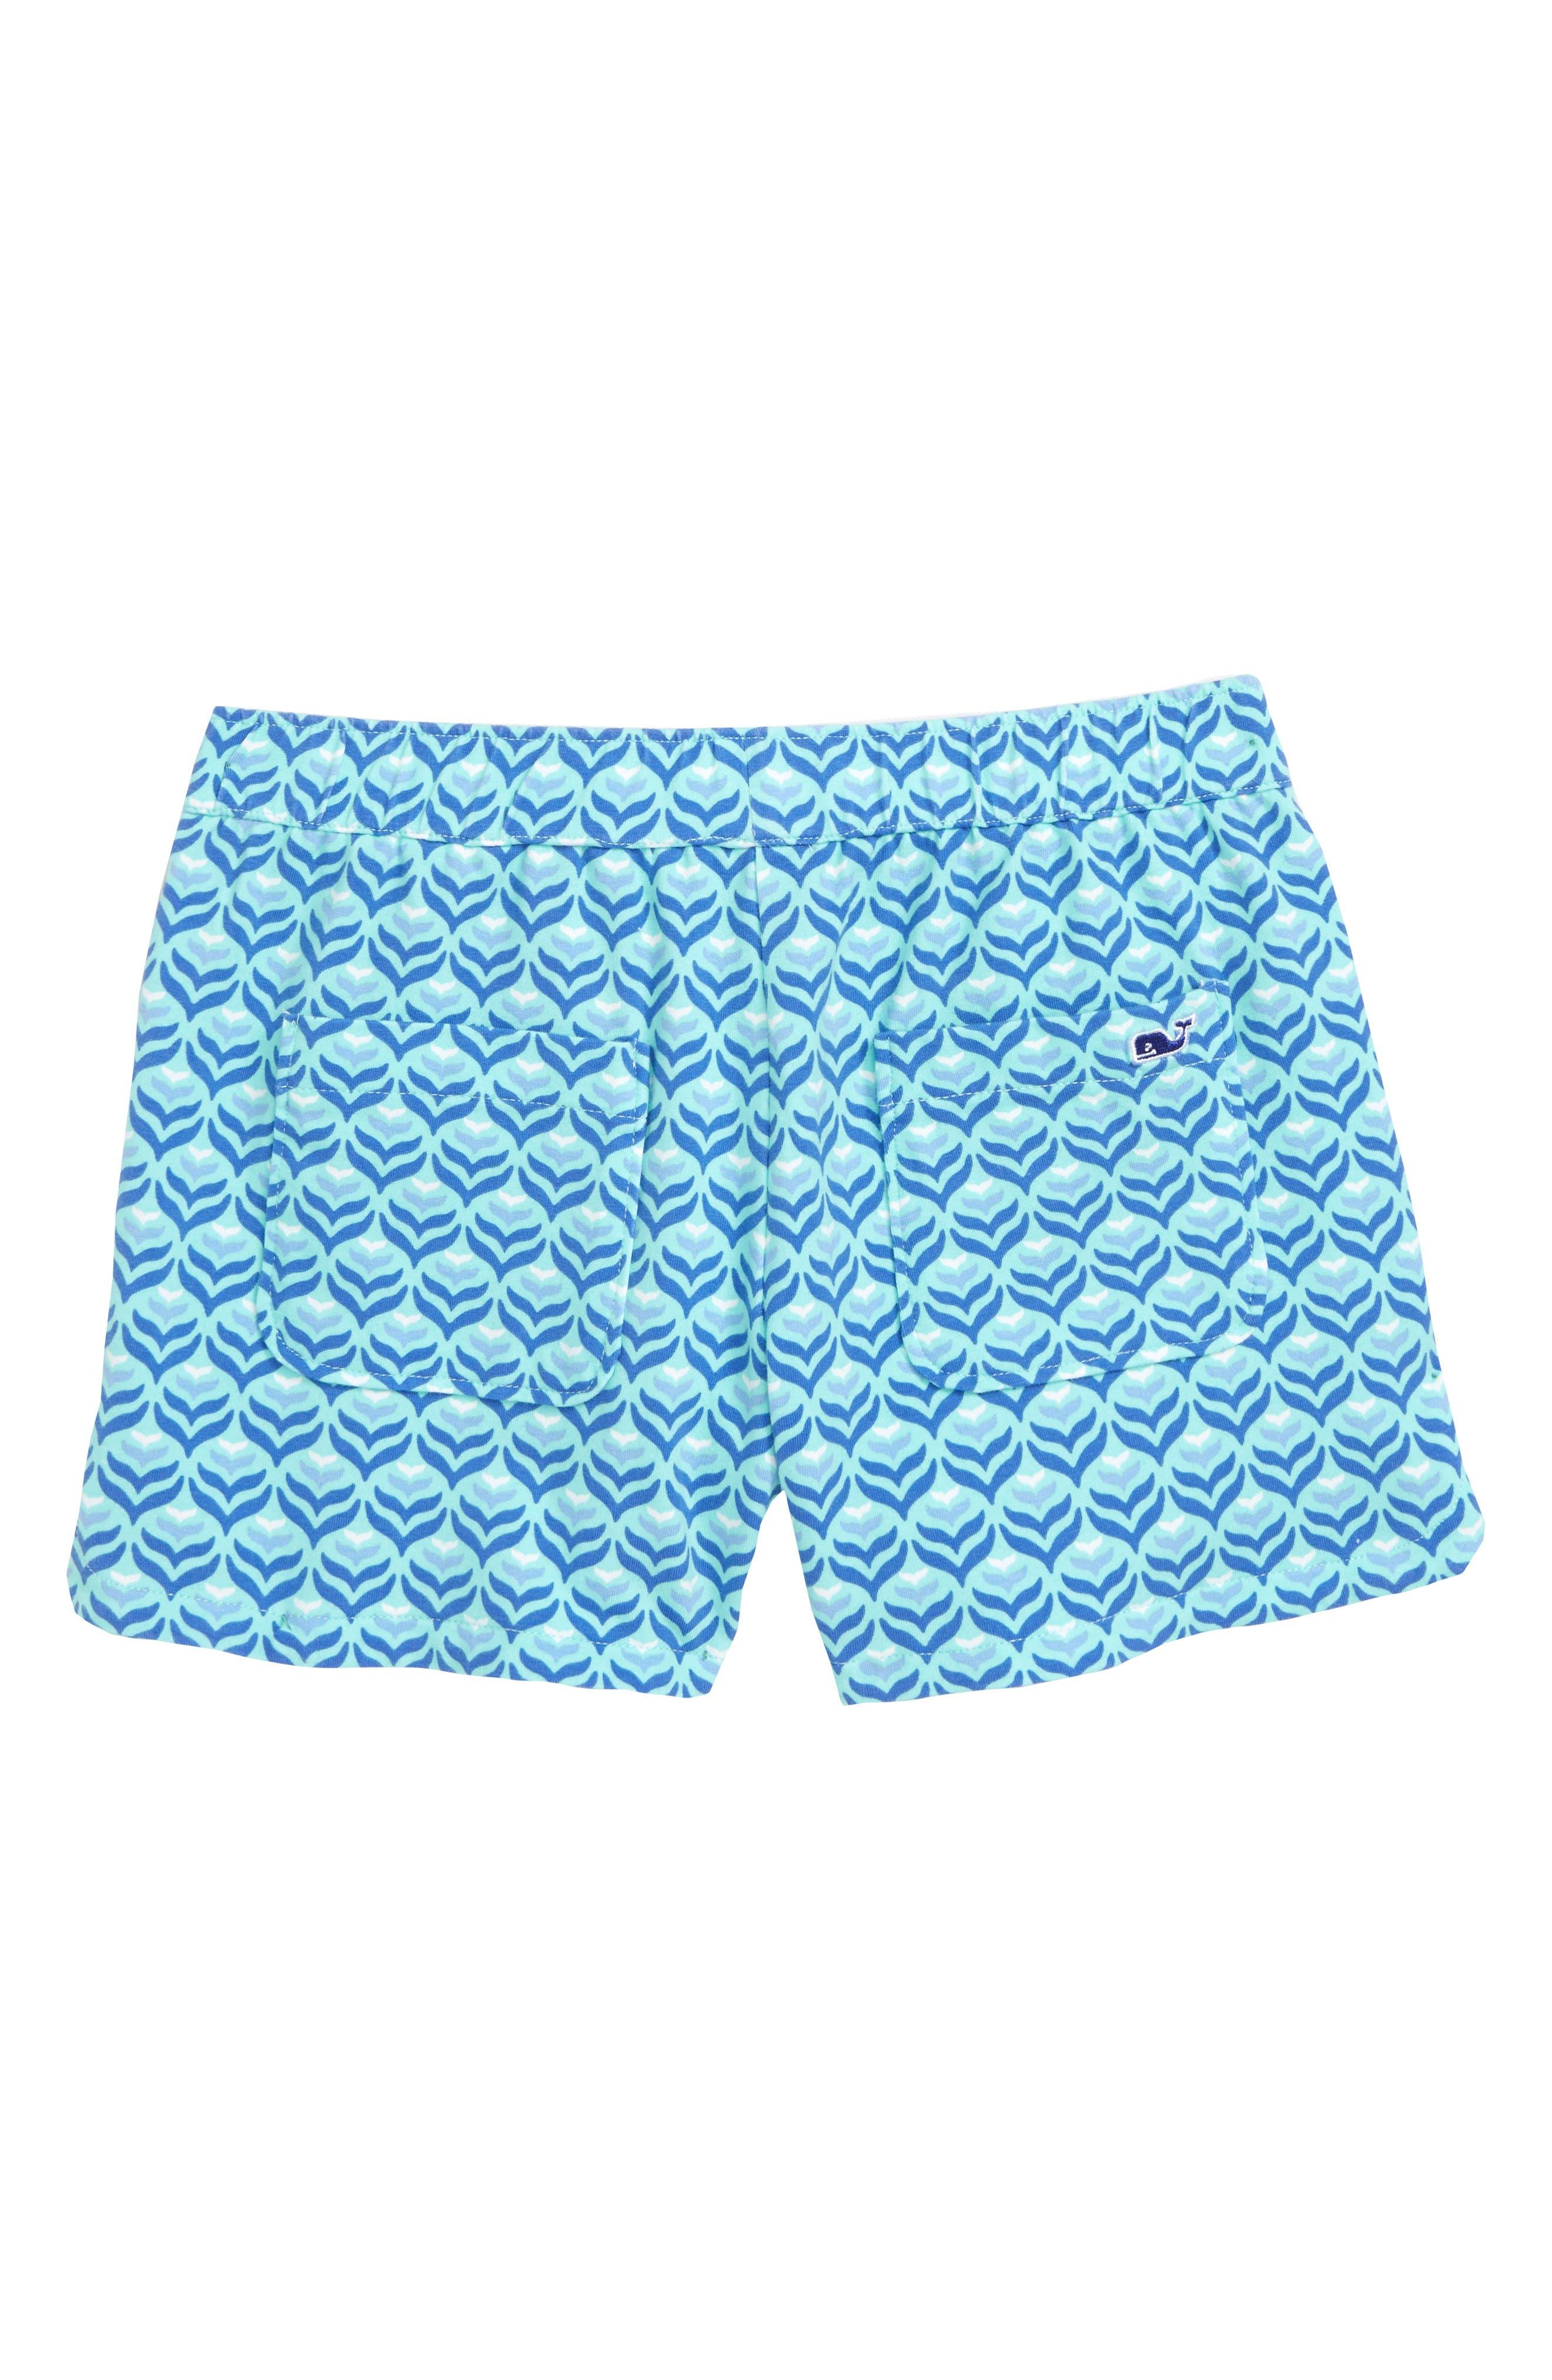 Diamond Whale Tail Shorts,                             Alternate thumbnail 2, color,                             416